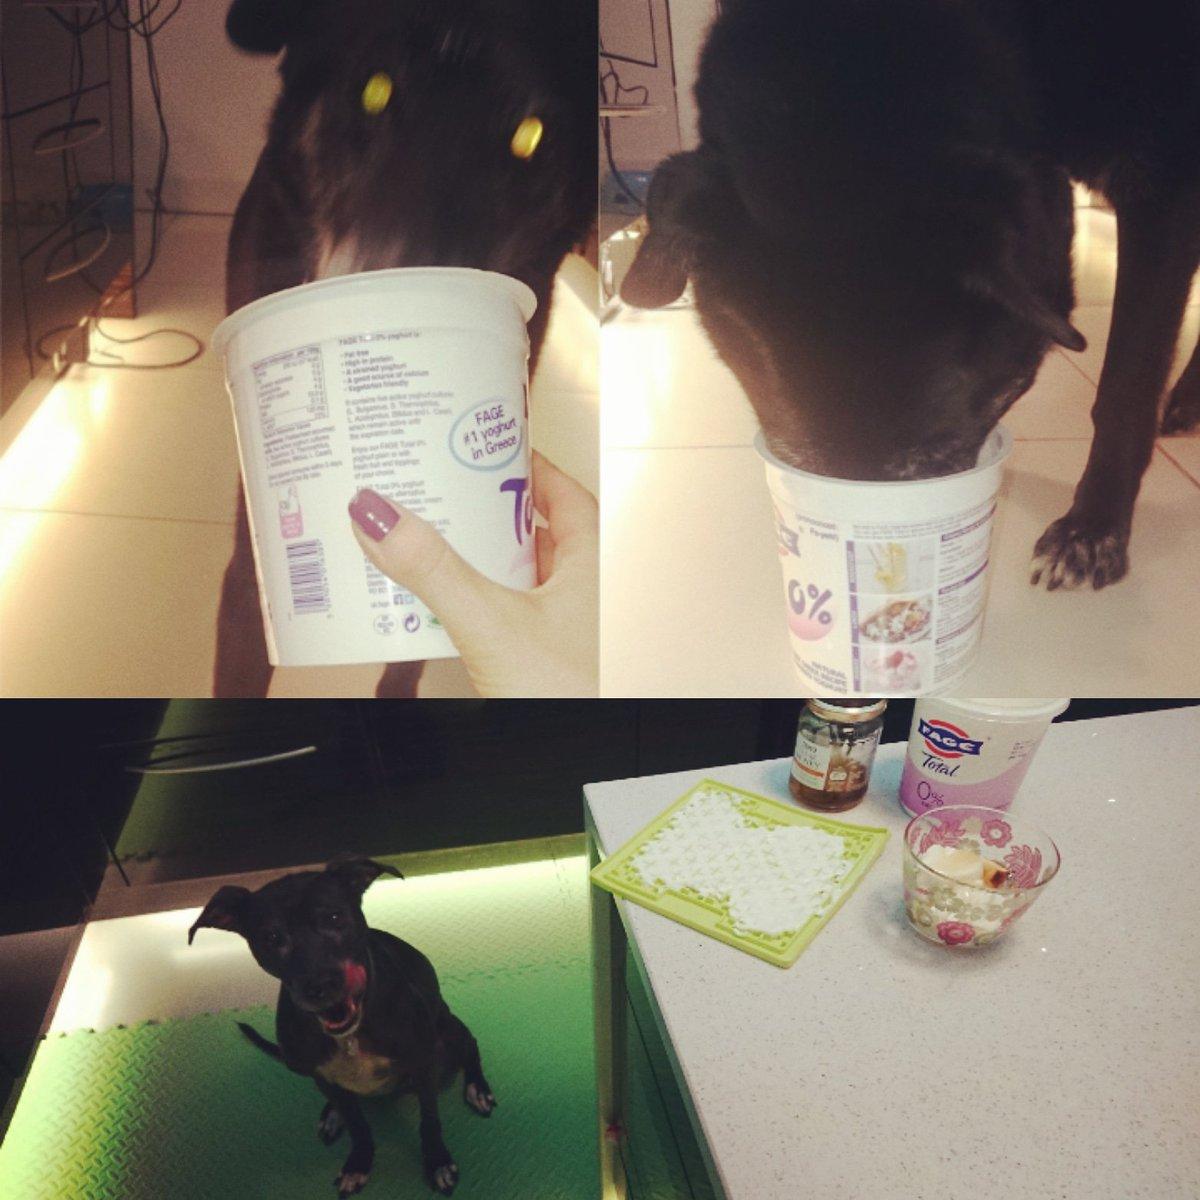 16.05.2017 & 13.11.2019 💕🌟 Memories old and memories new 🌟 💕 #becausemilly #girlsnightsin #yogurtyummies #lovemygirls #Milly💖&Clover🍀 #spoilt #specialtreats #alwaysremember #alwaysloved #neverforgotten #dogsoftwitter  🐾